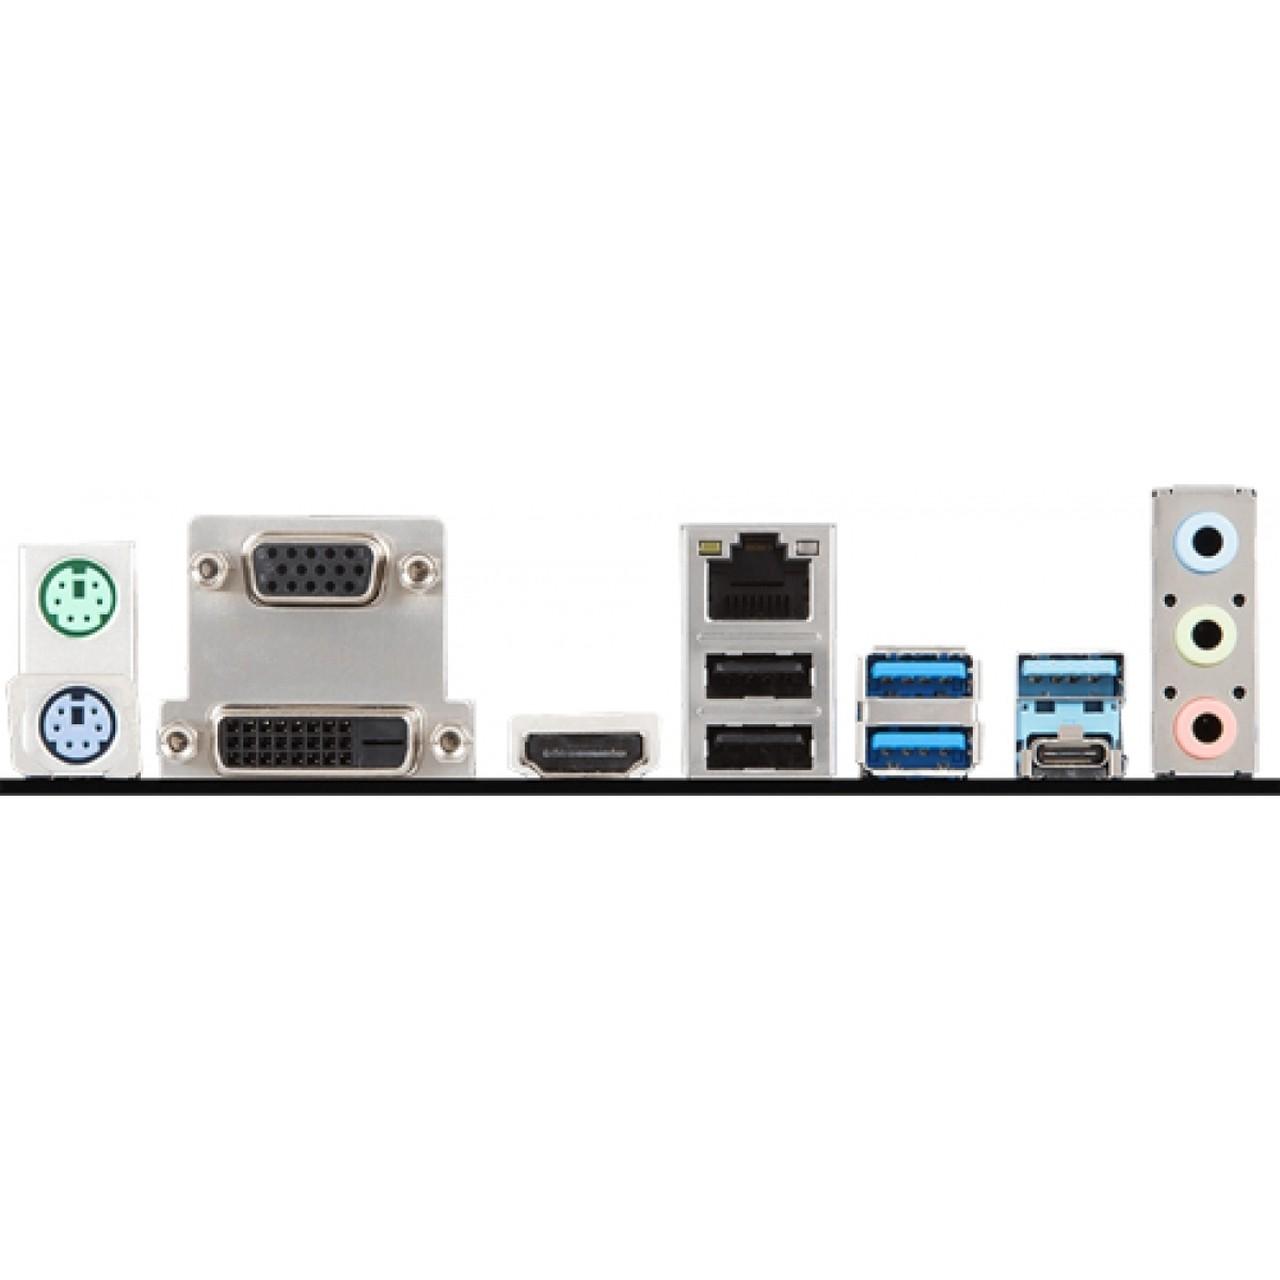 KIT UPGRADE PROCESSADOR INTEL I5 9600K / PLACA MÃE MSI B360M PRO VDH